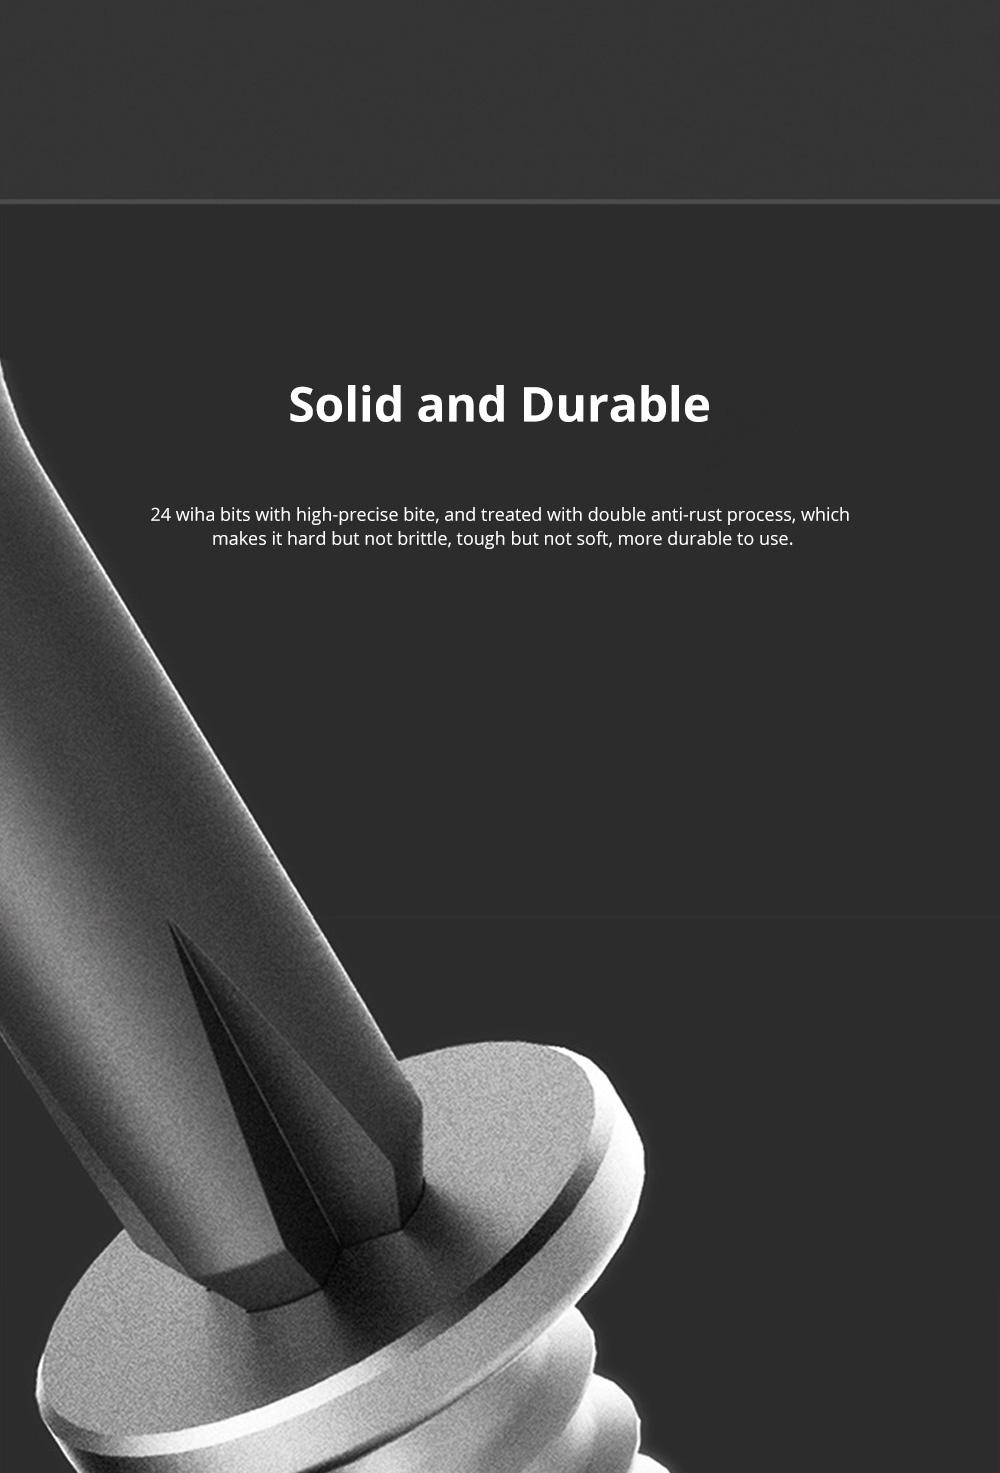 MI Wiha Precision Screwdrivers Set 25 in 1 Household Repair Tool Kits with Aluminum Storage Box for Appliance Repair 3